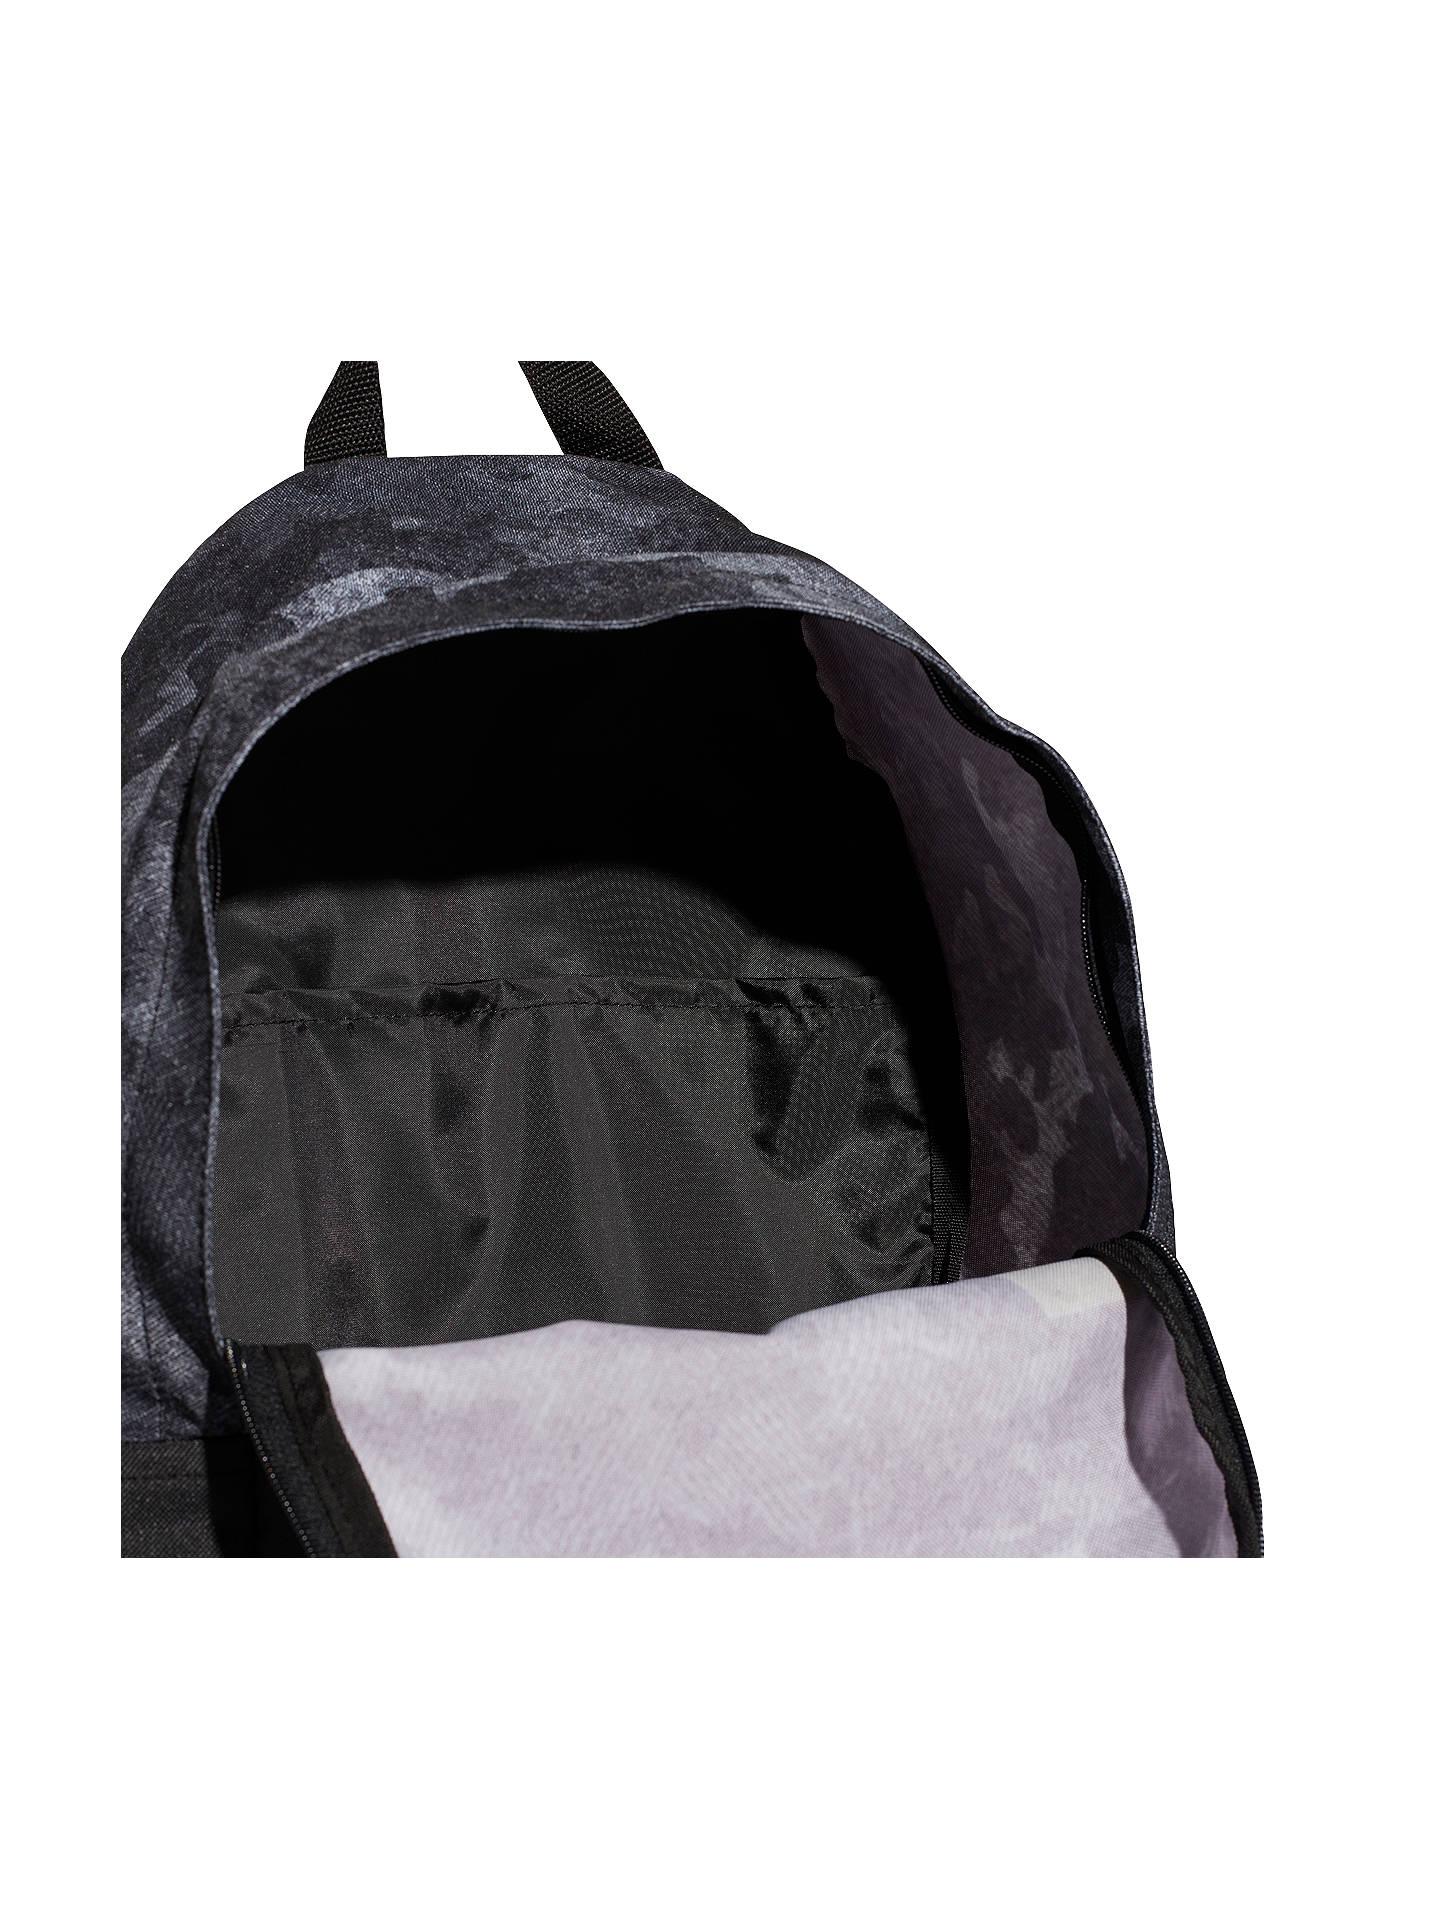 f8b5f85e346 ... Buy adidas Camo Classic Backpack, Black Online at johnlewis.com